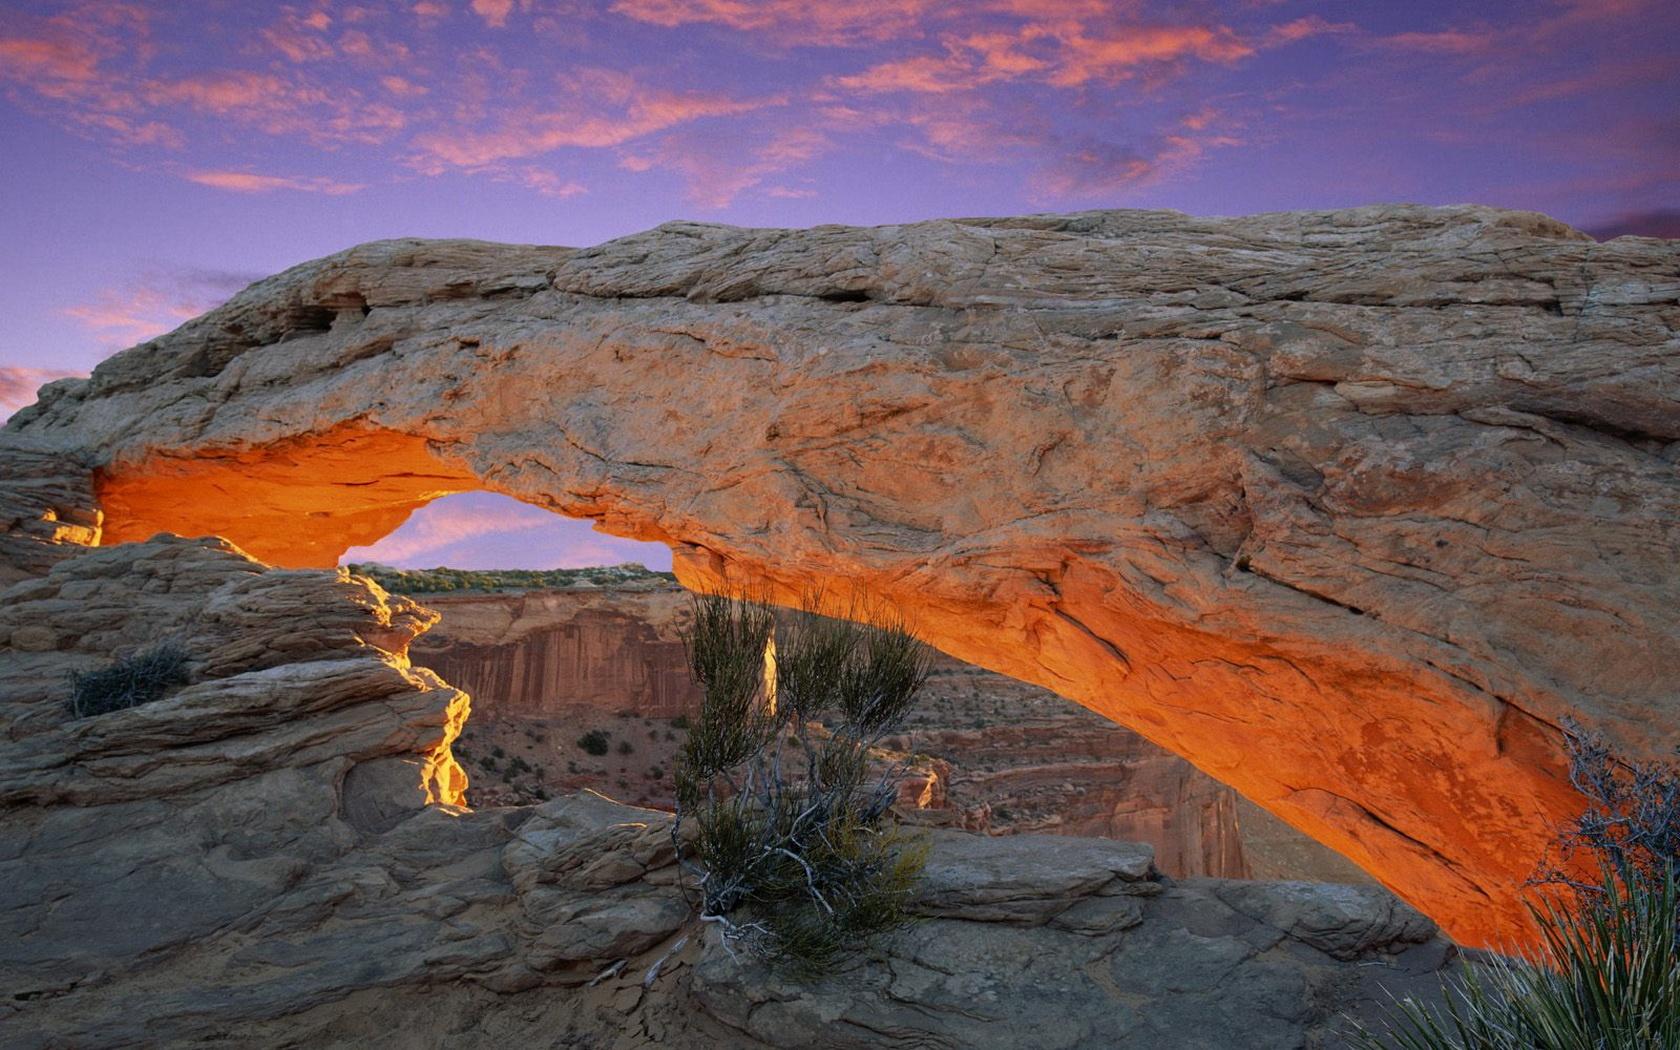 Canyonlands National Park canyonlands gray national park nature 1680x1050